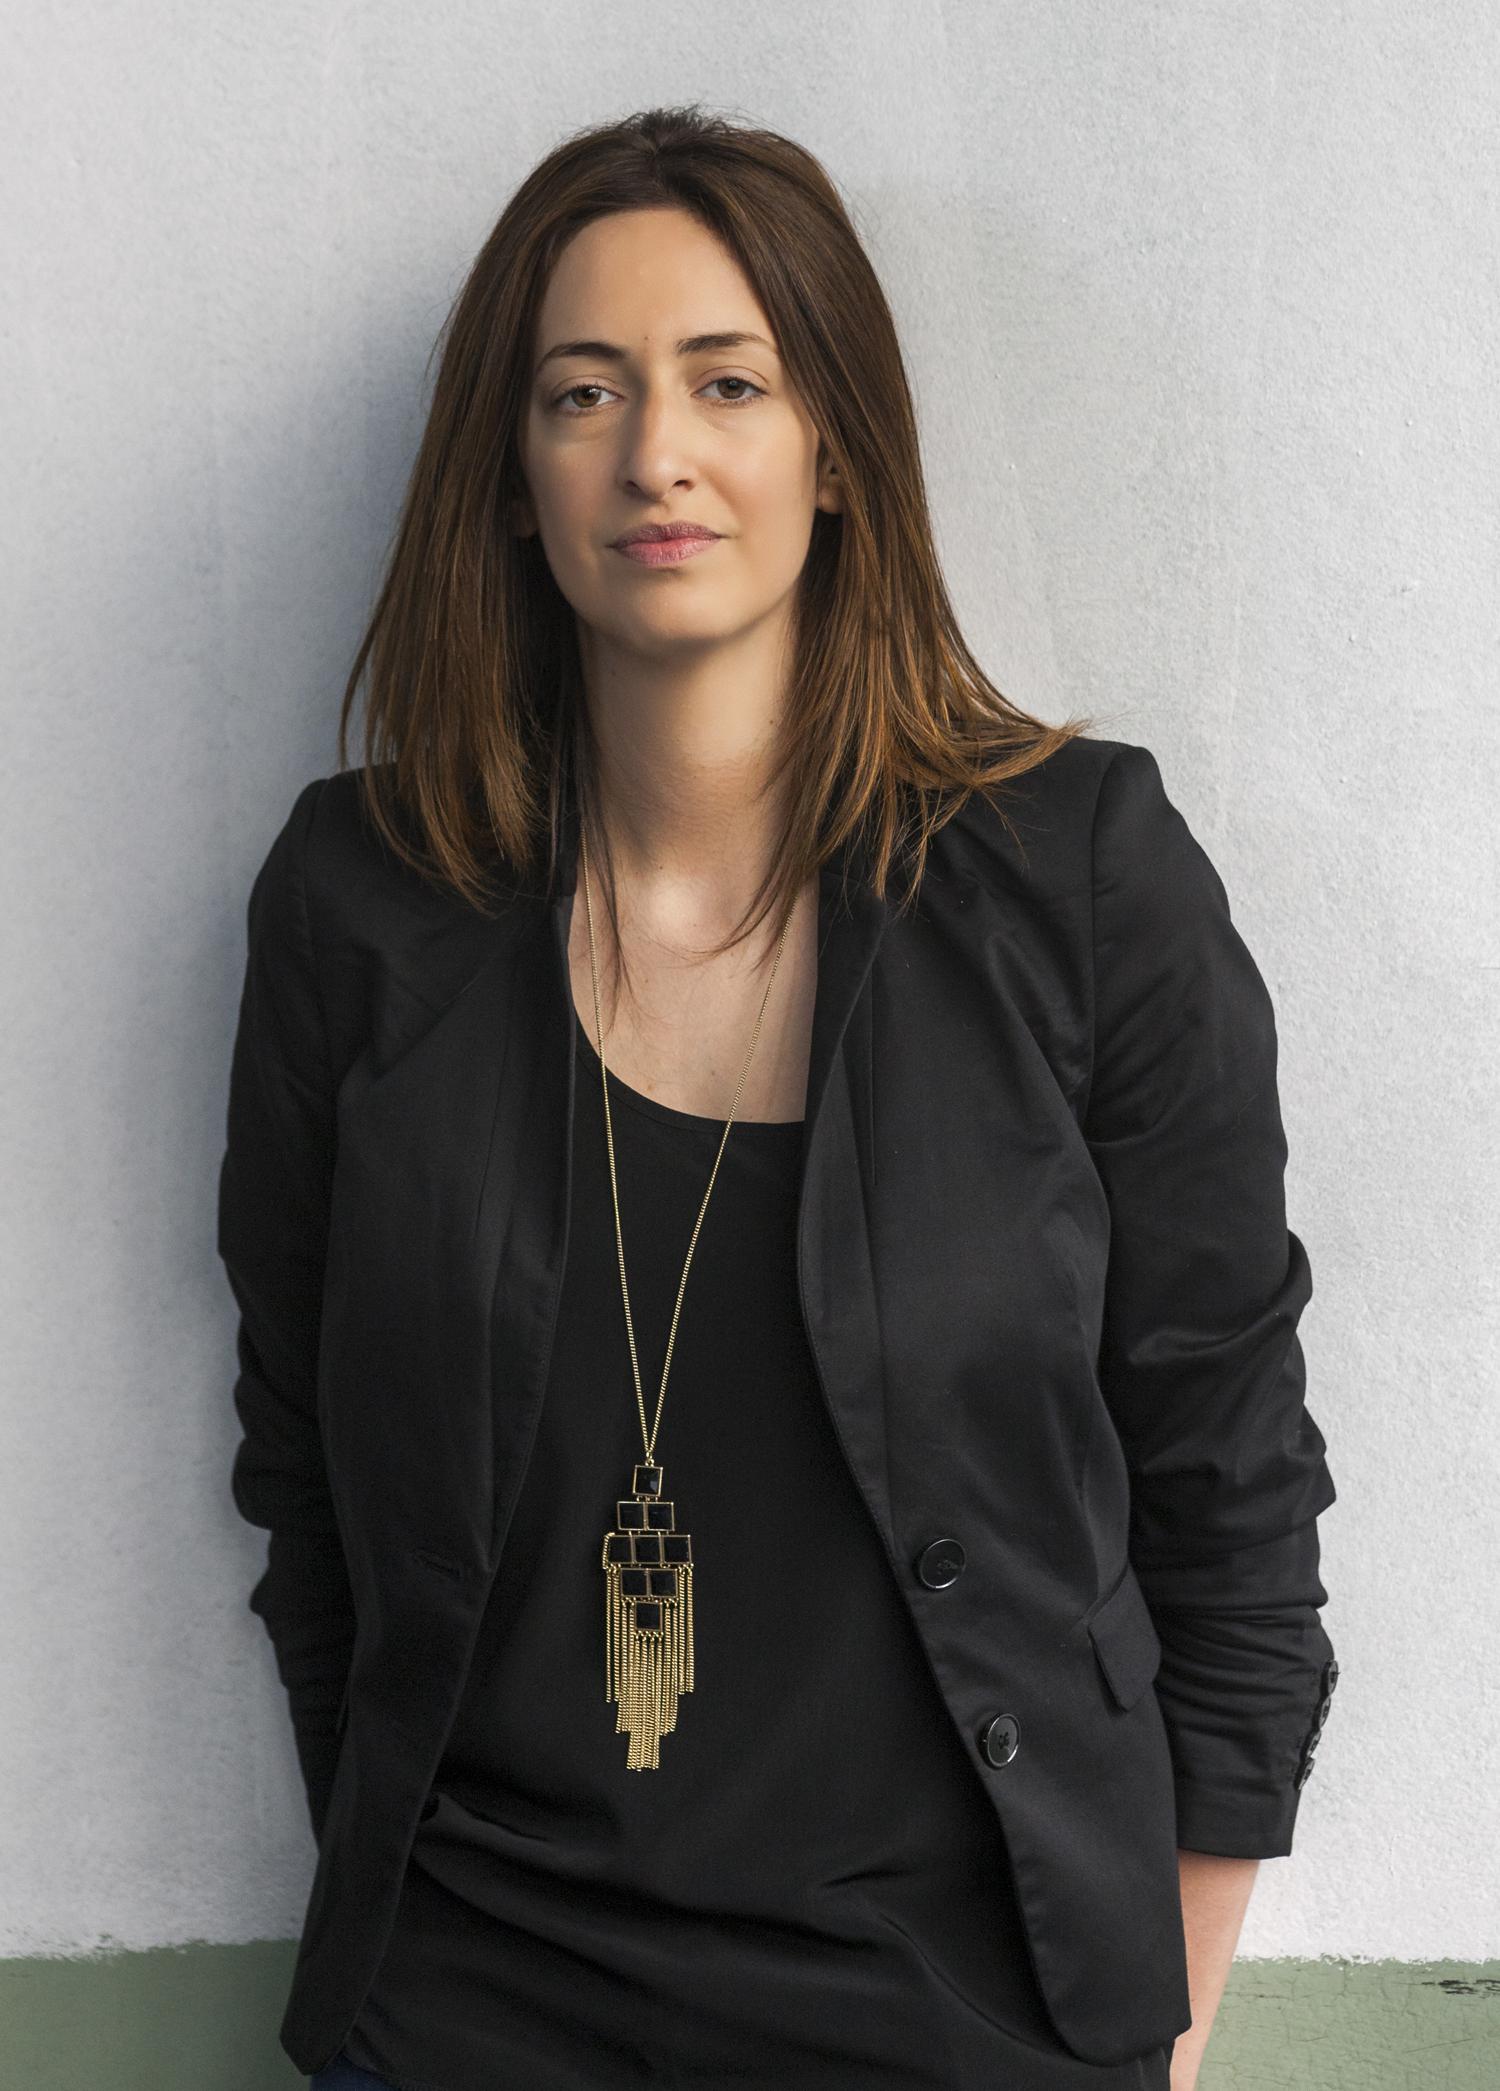 Deborah Spencer, designjunction Event Director and reigning queen of the London design scene